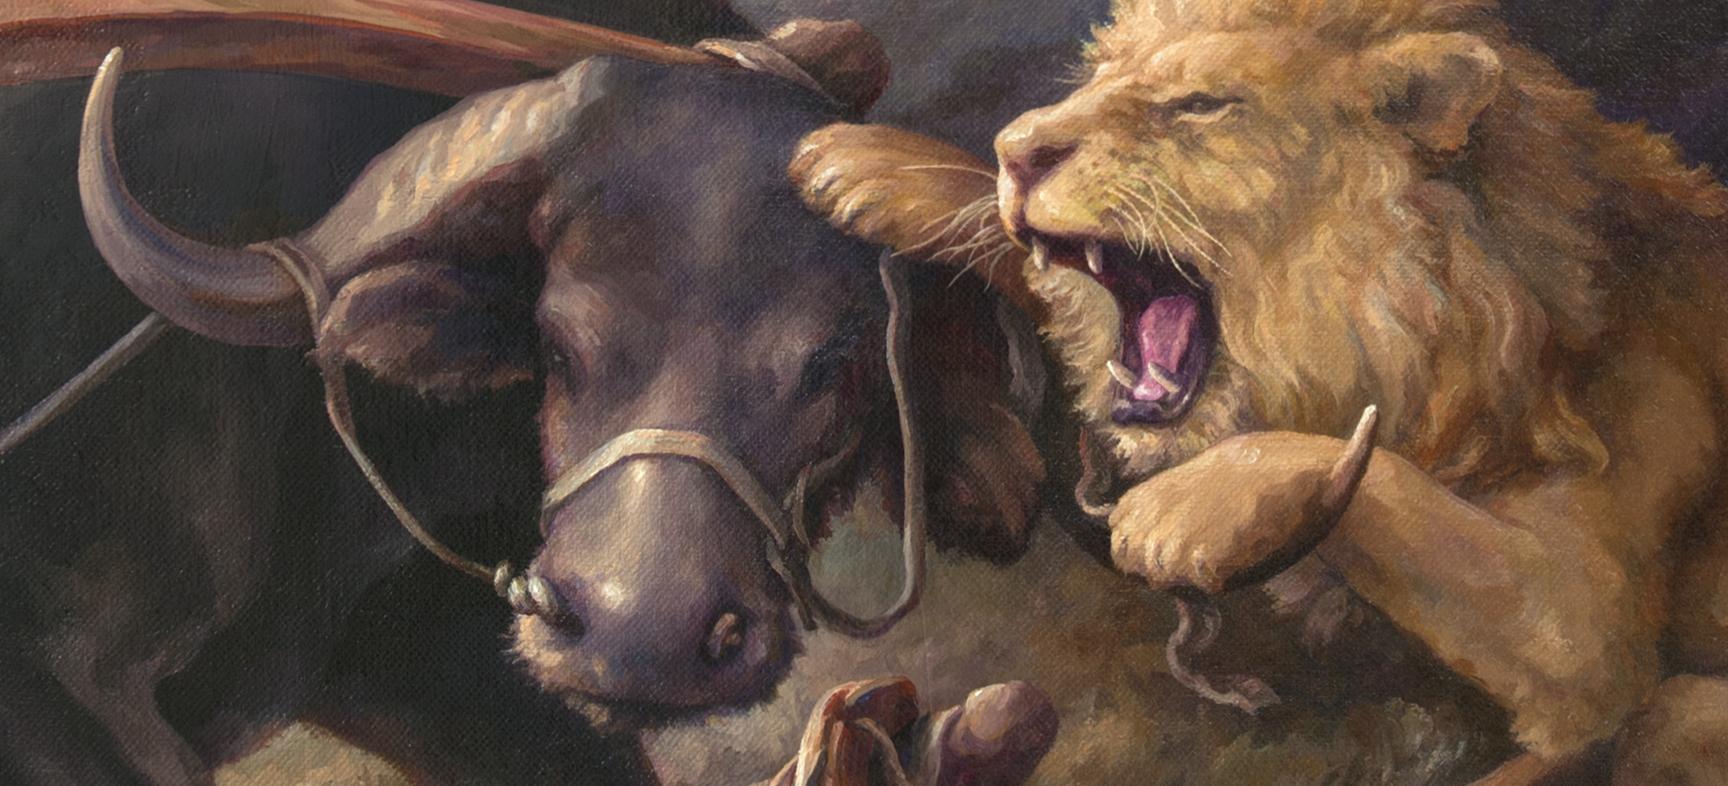 Confronting the Lions, details